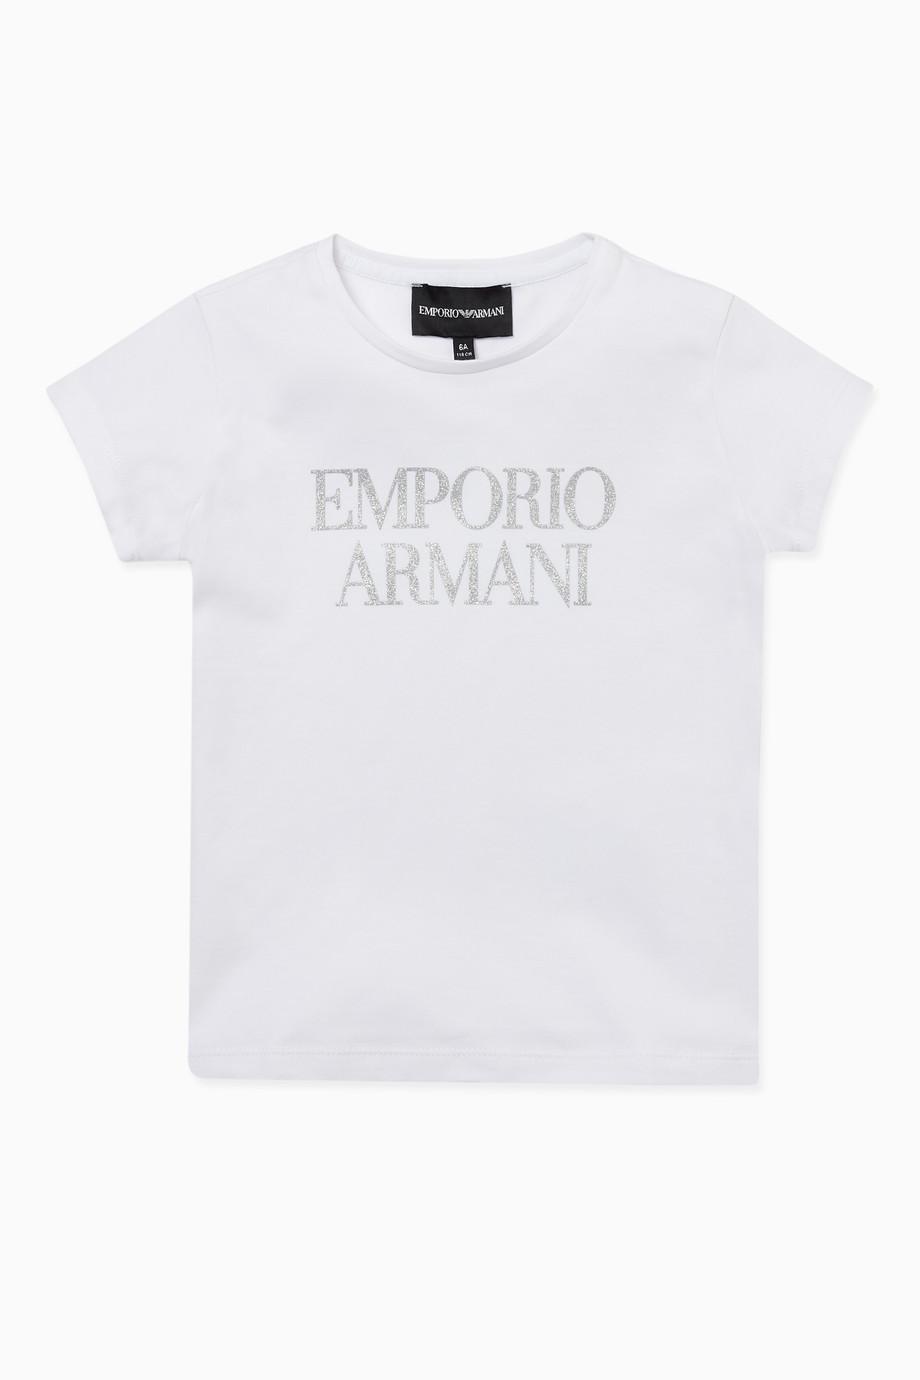 757f5a59 Shop Emporio Armani White Glitter Logo Print T-Shirt for Kids | Ounass